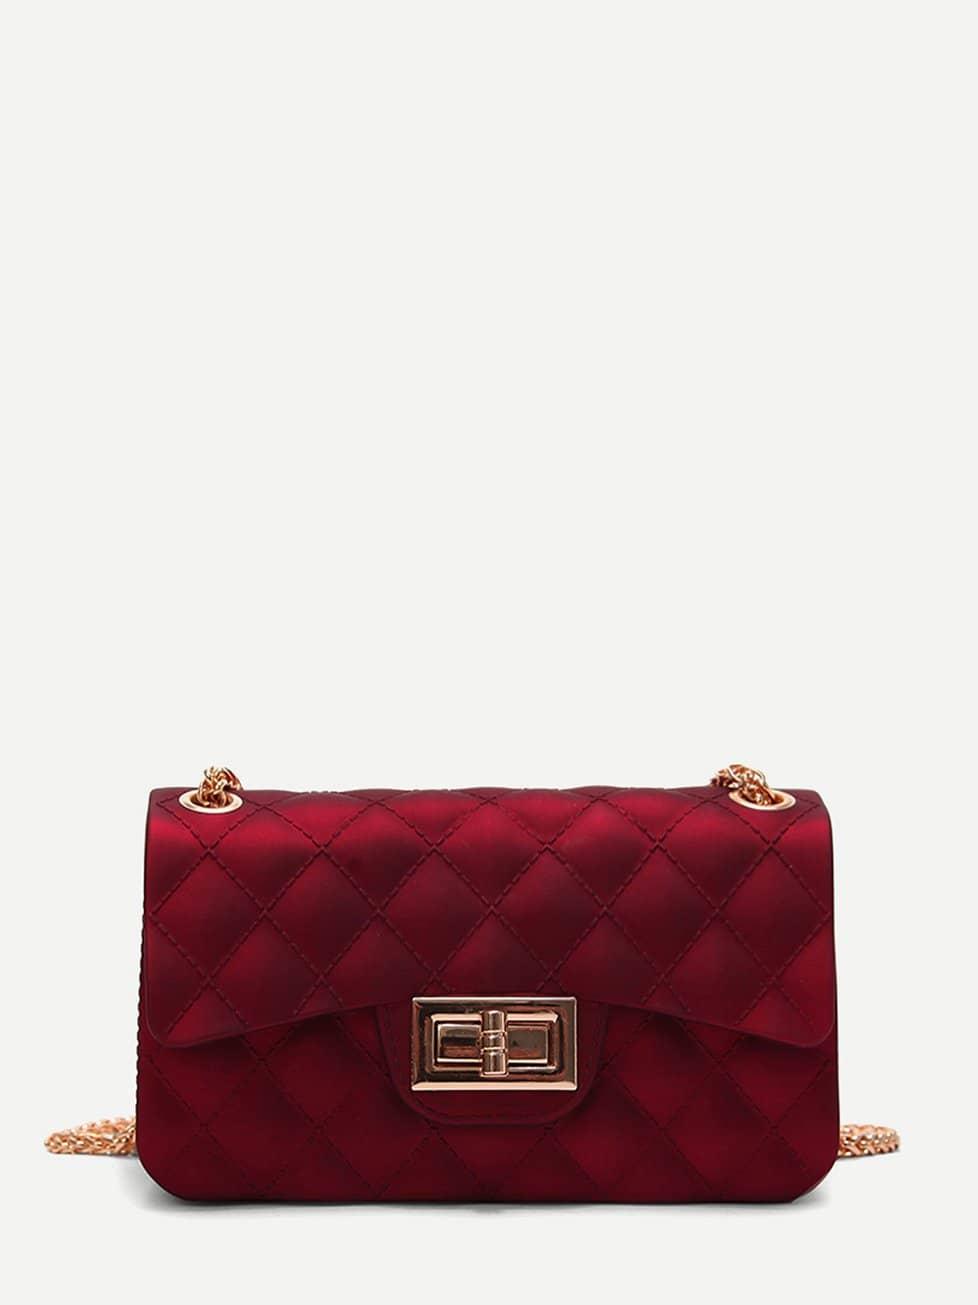 Twist Lock Quilted Chain Bag 120cm 47 bronze twist o ring bag chain diy metal purse strap 20pcs freeshipping